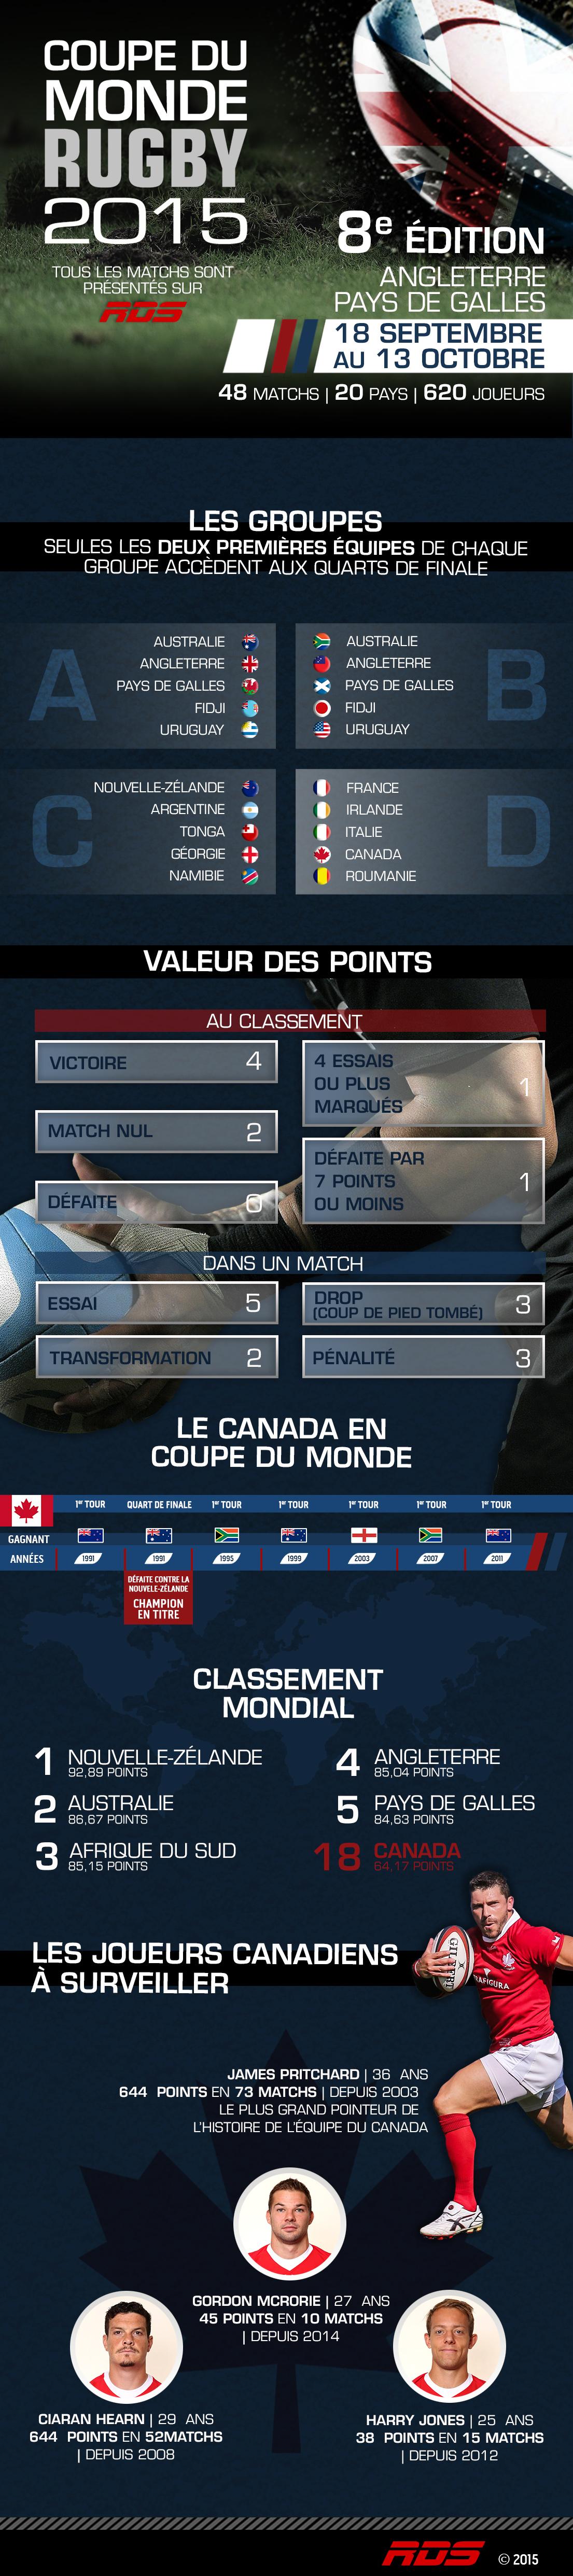 Infographie coupe du monde 2015 - Classement coupe monde rugby 2015 ...